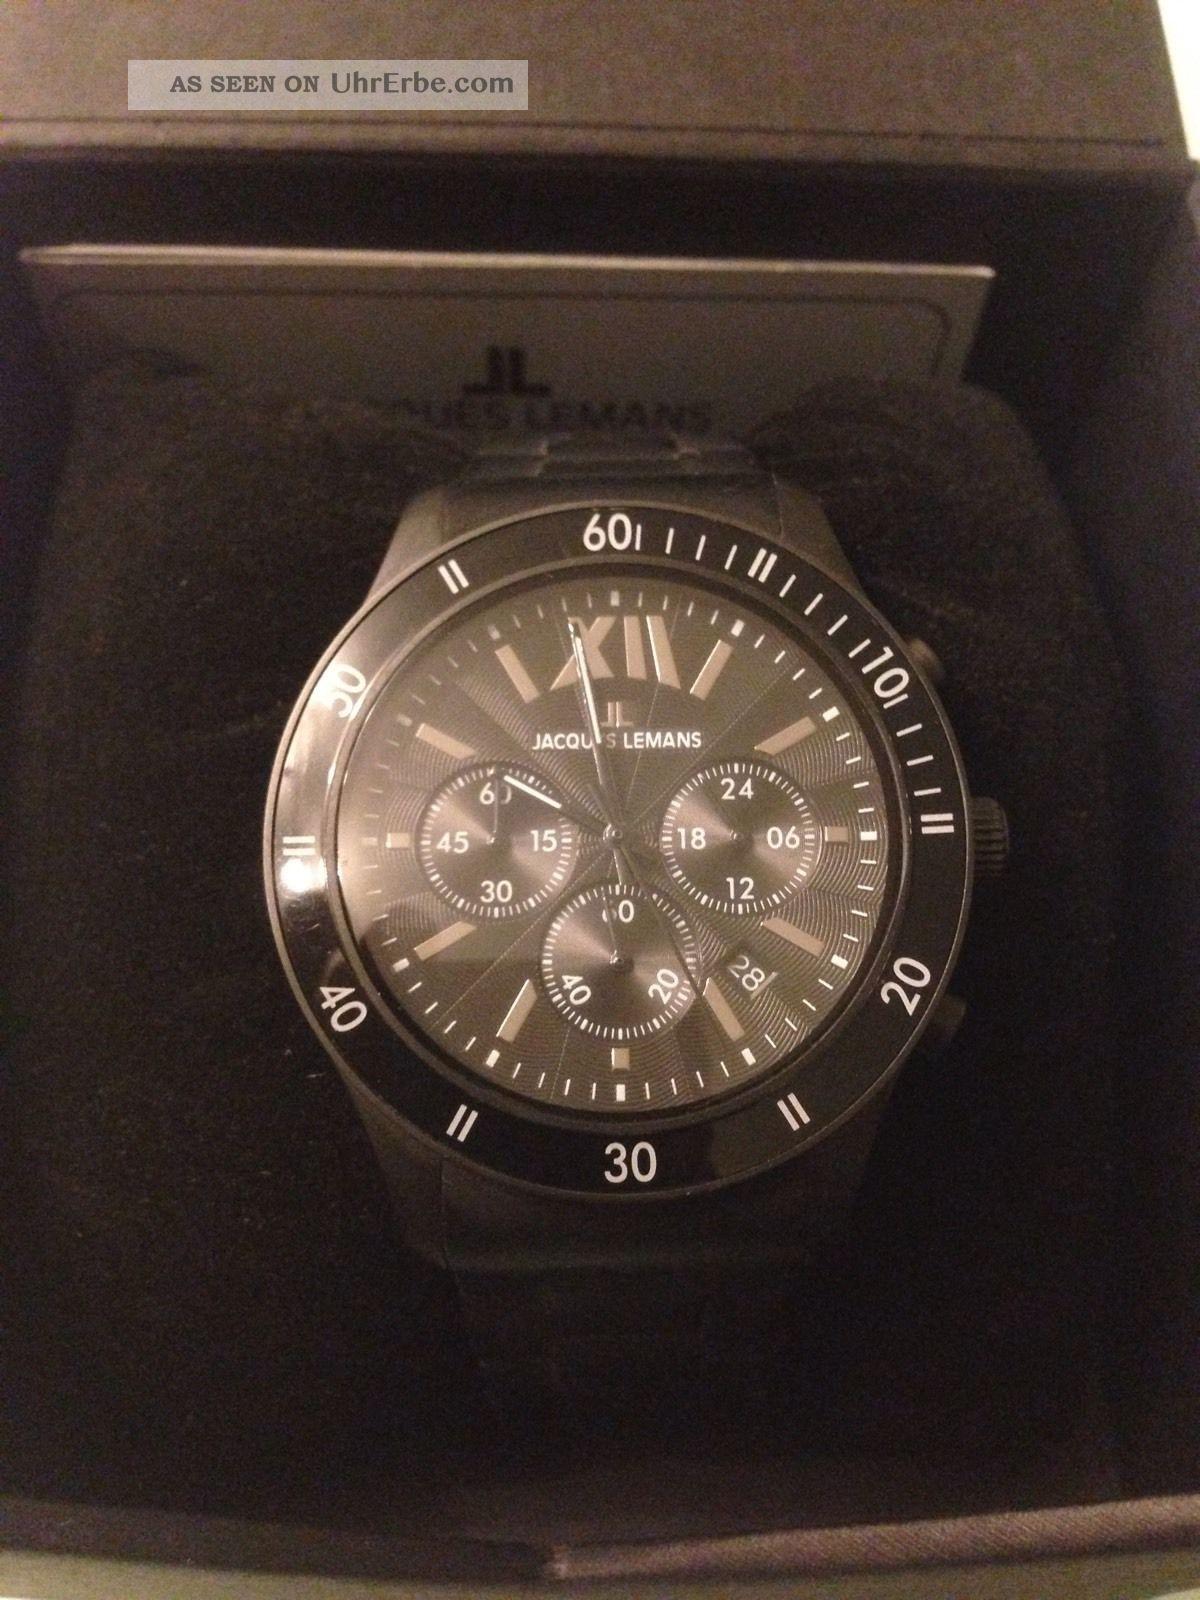 Jacques Lemans Herren Armbanduhr Schwarz Sportive Chronograph Armbanduhren Bild